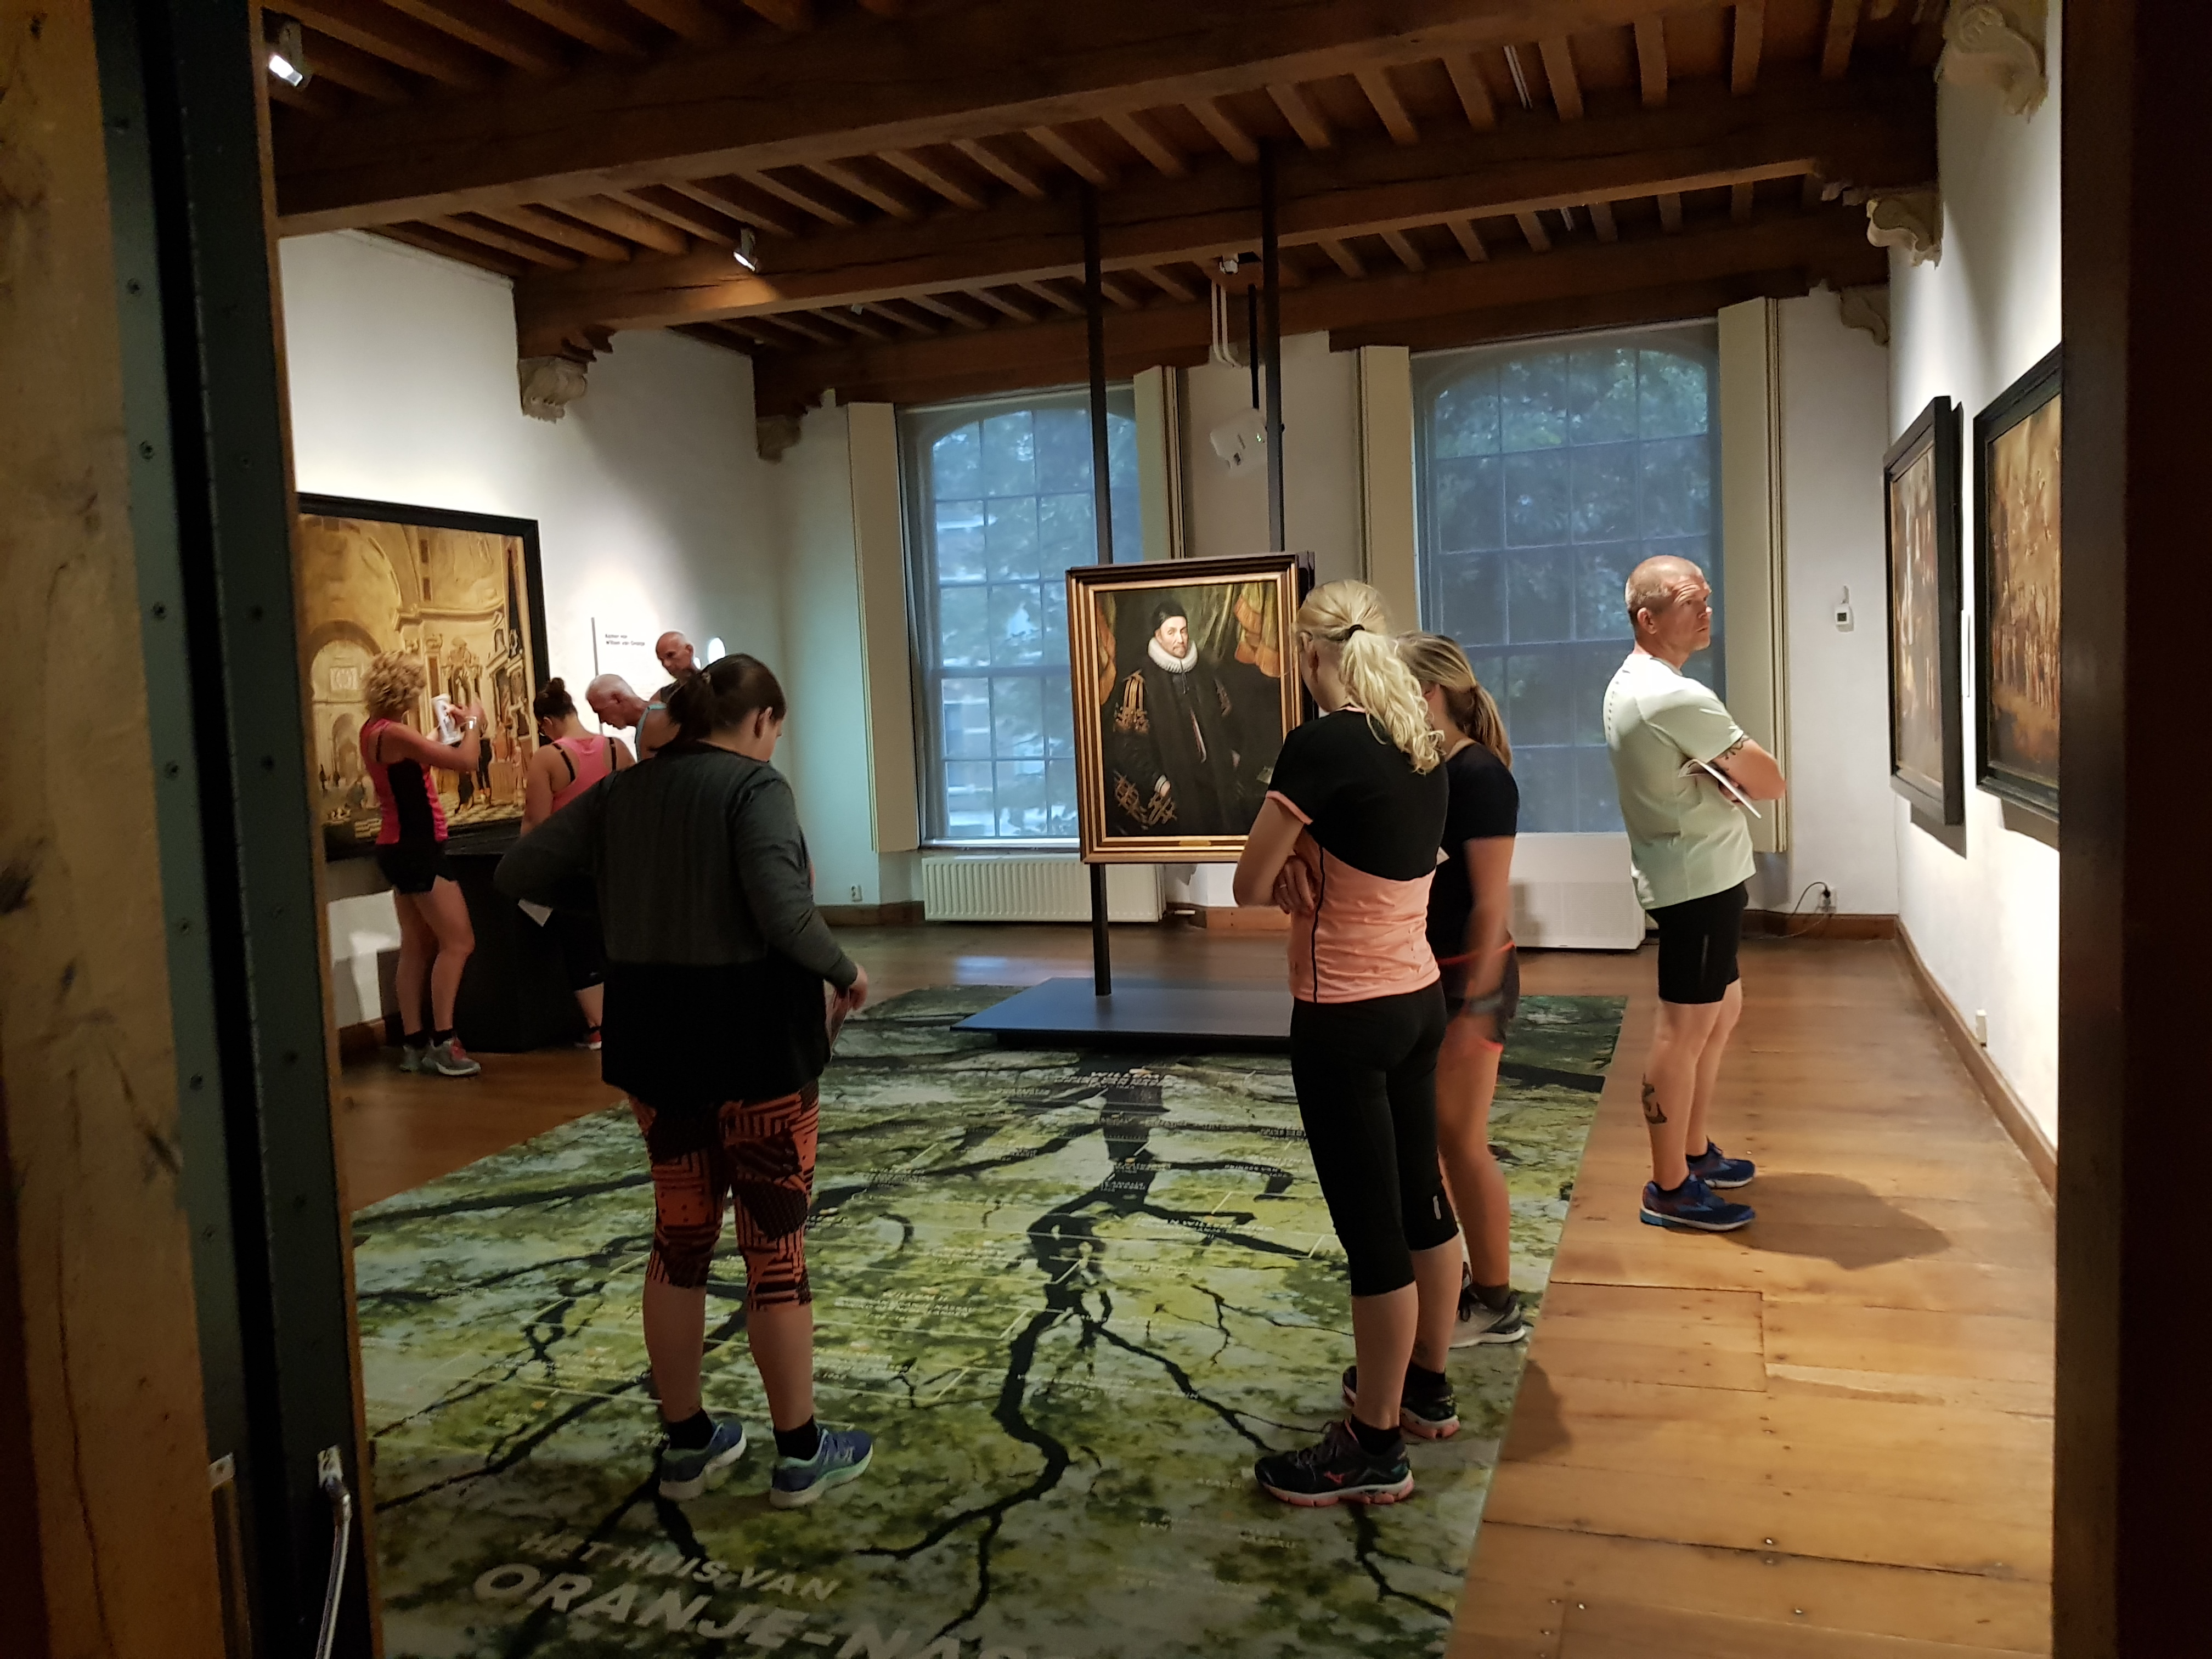 Museum Prinsenhof, hardlopen in Delft